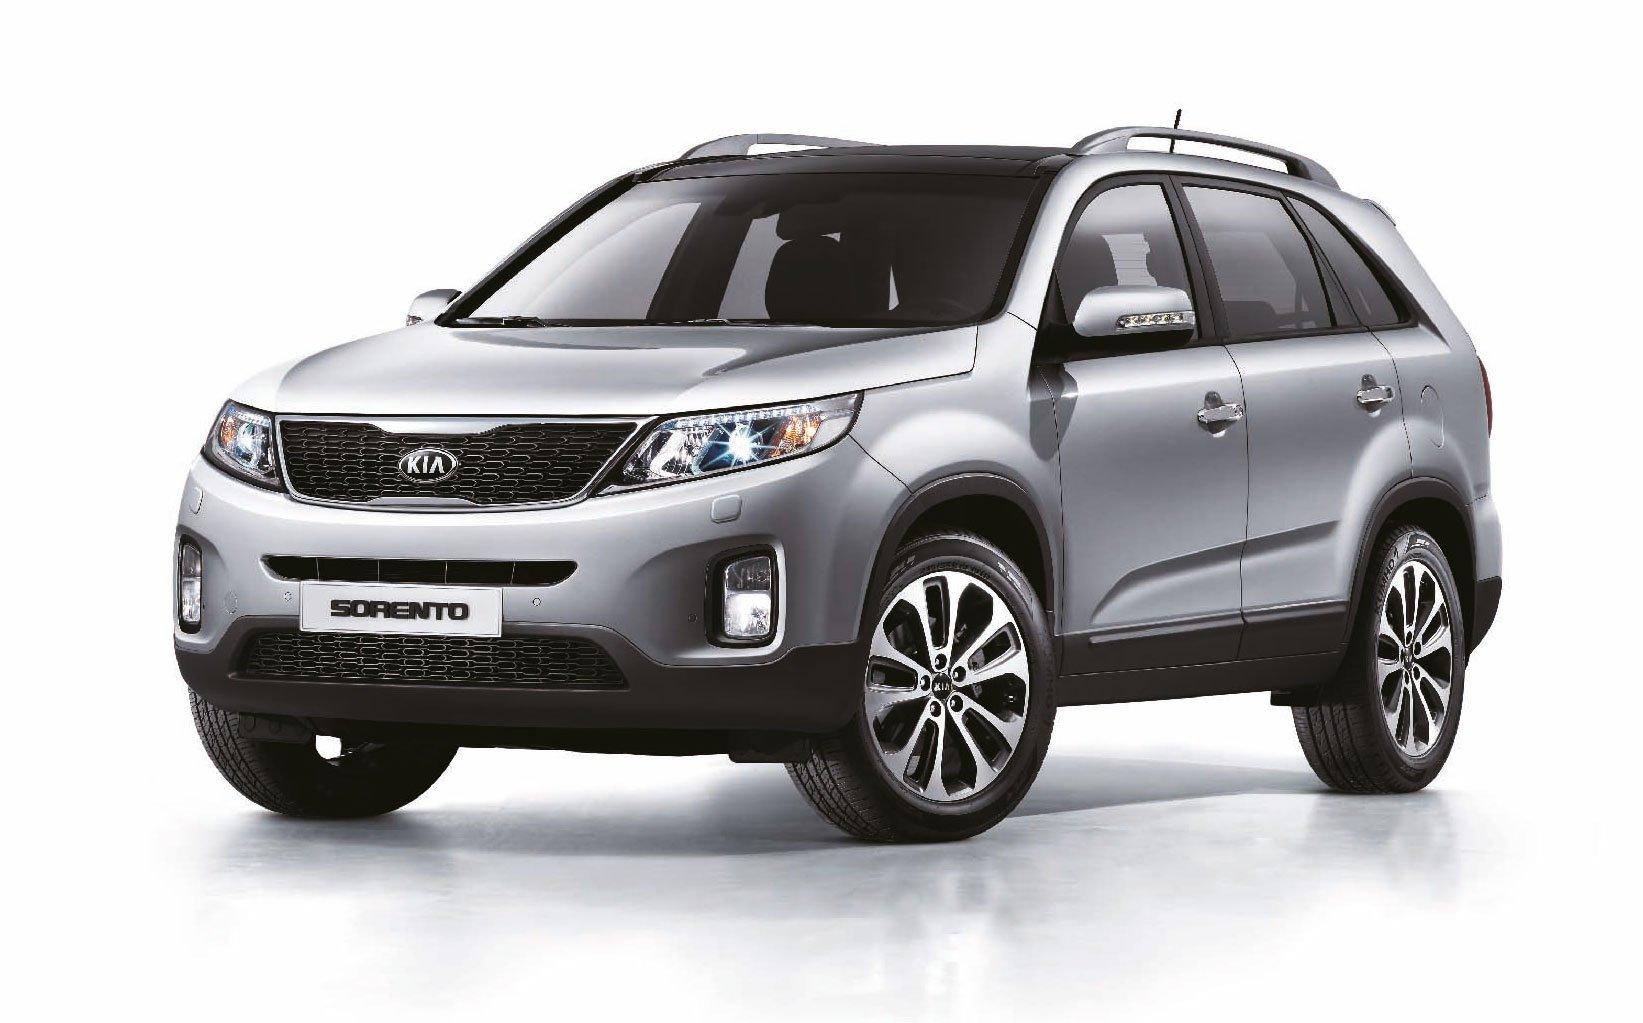 New Kia Sorento Launched 2 4l Petrol Rm158 888